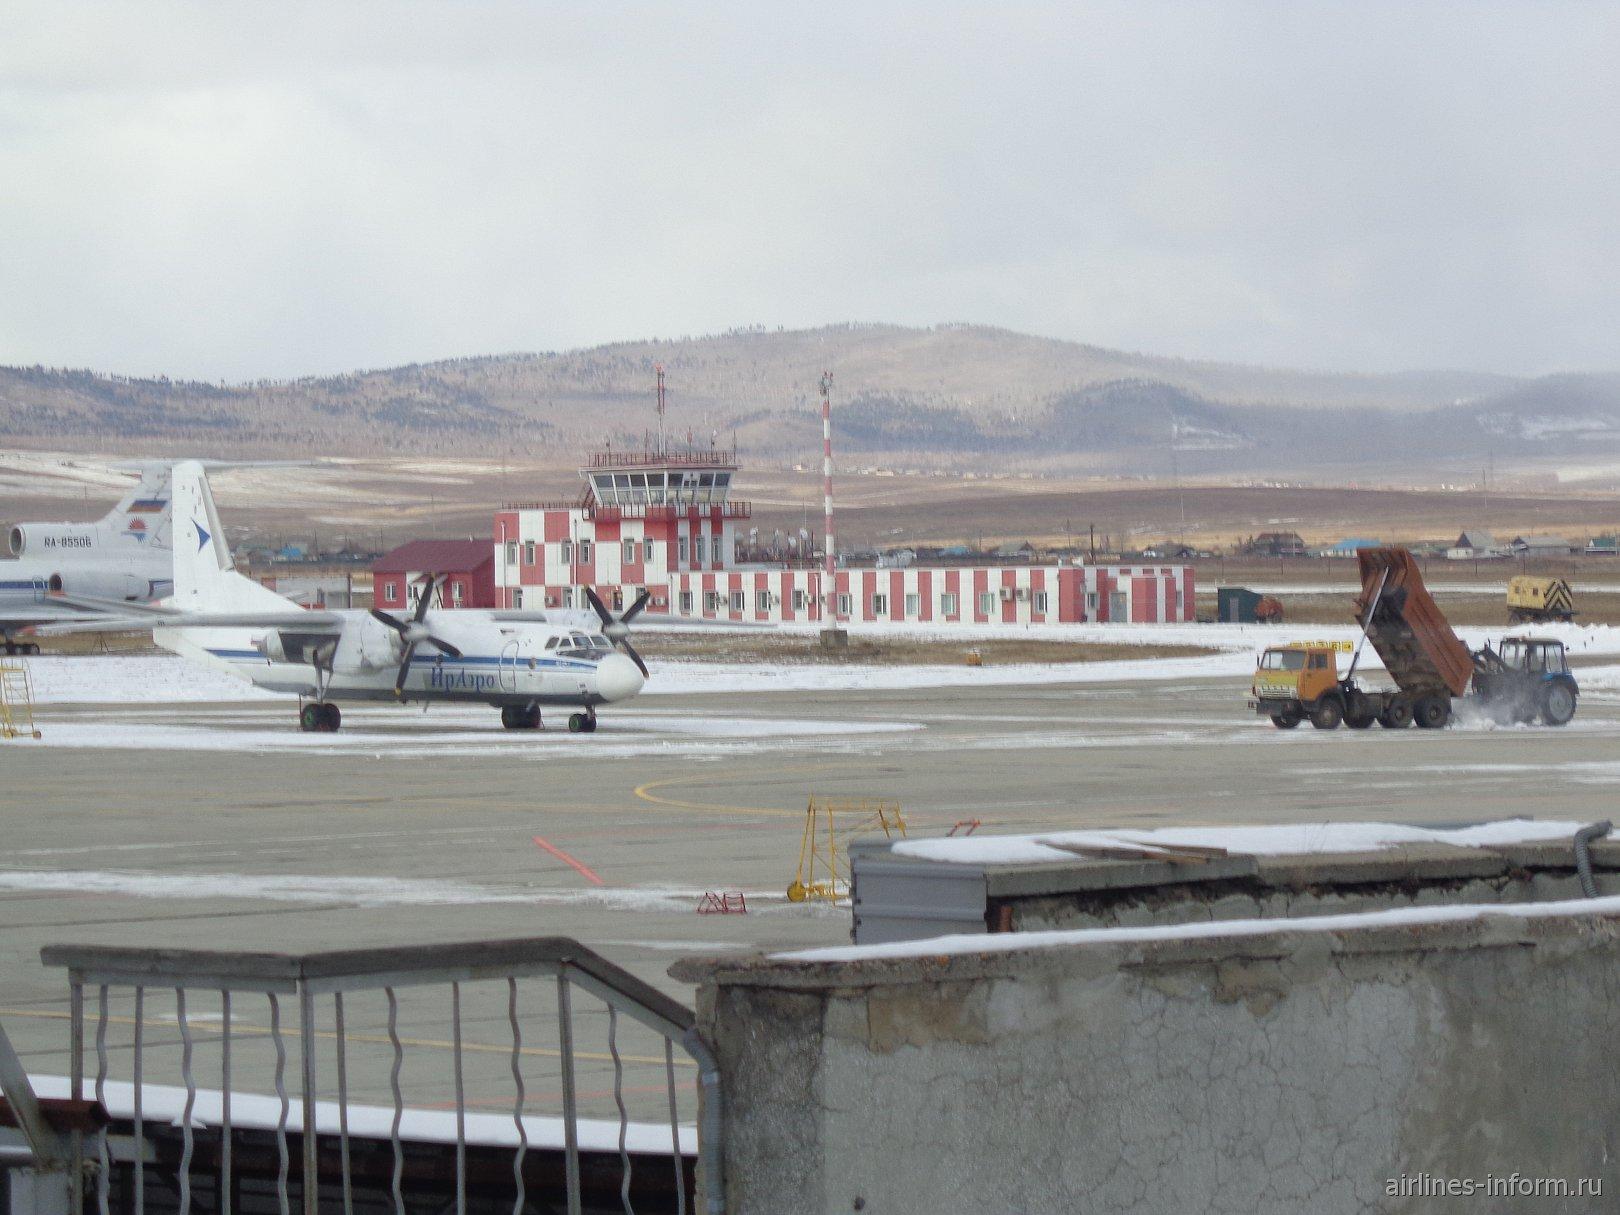 АН-26 авиакомпании Ираэро в аэропорту Кадала, город Чита